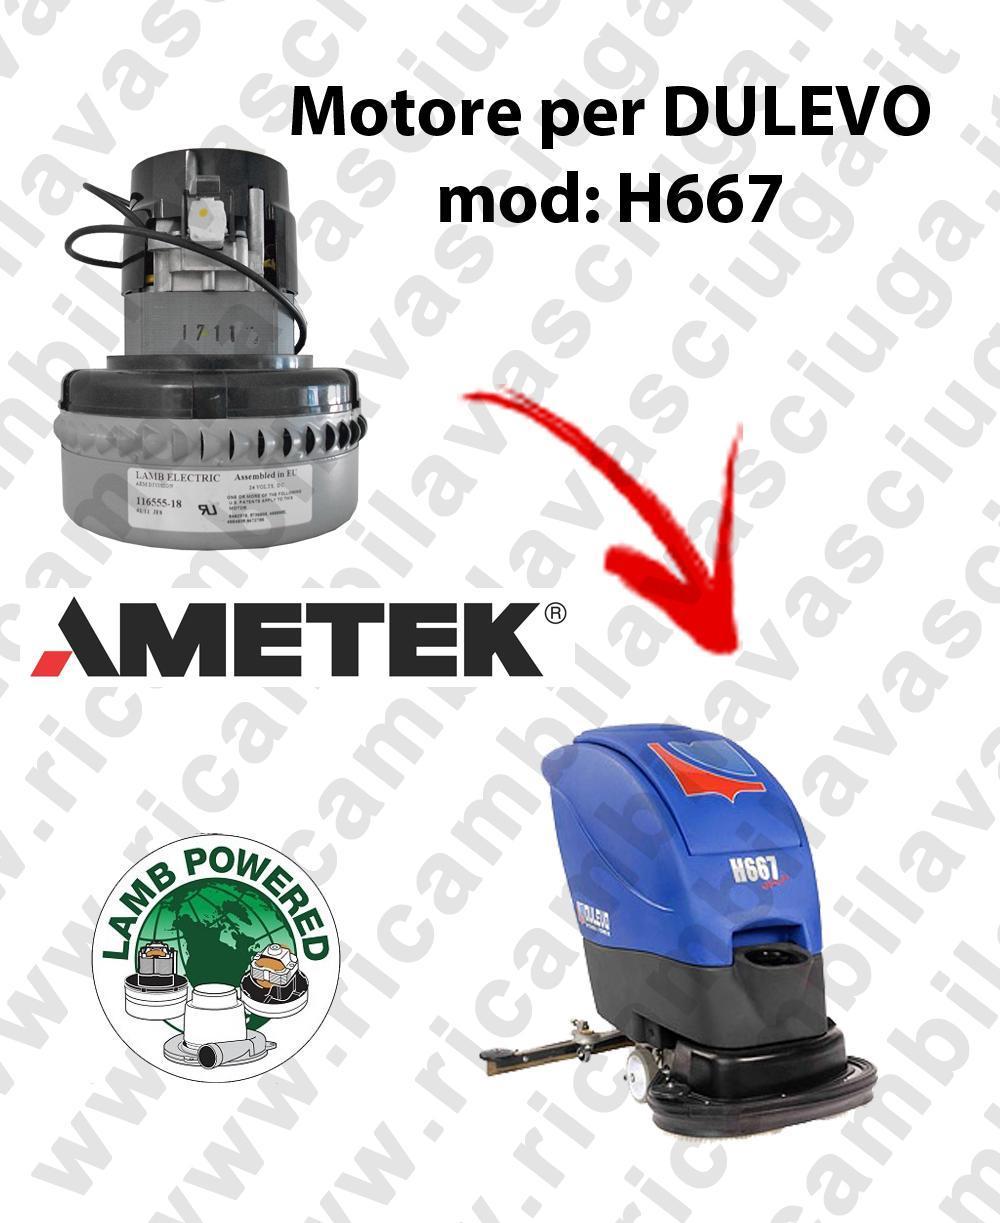 H667 Motore de aspiración LAMB AMETEK para fregadora DULEVO